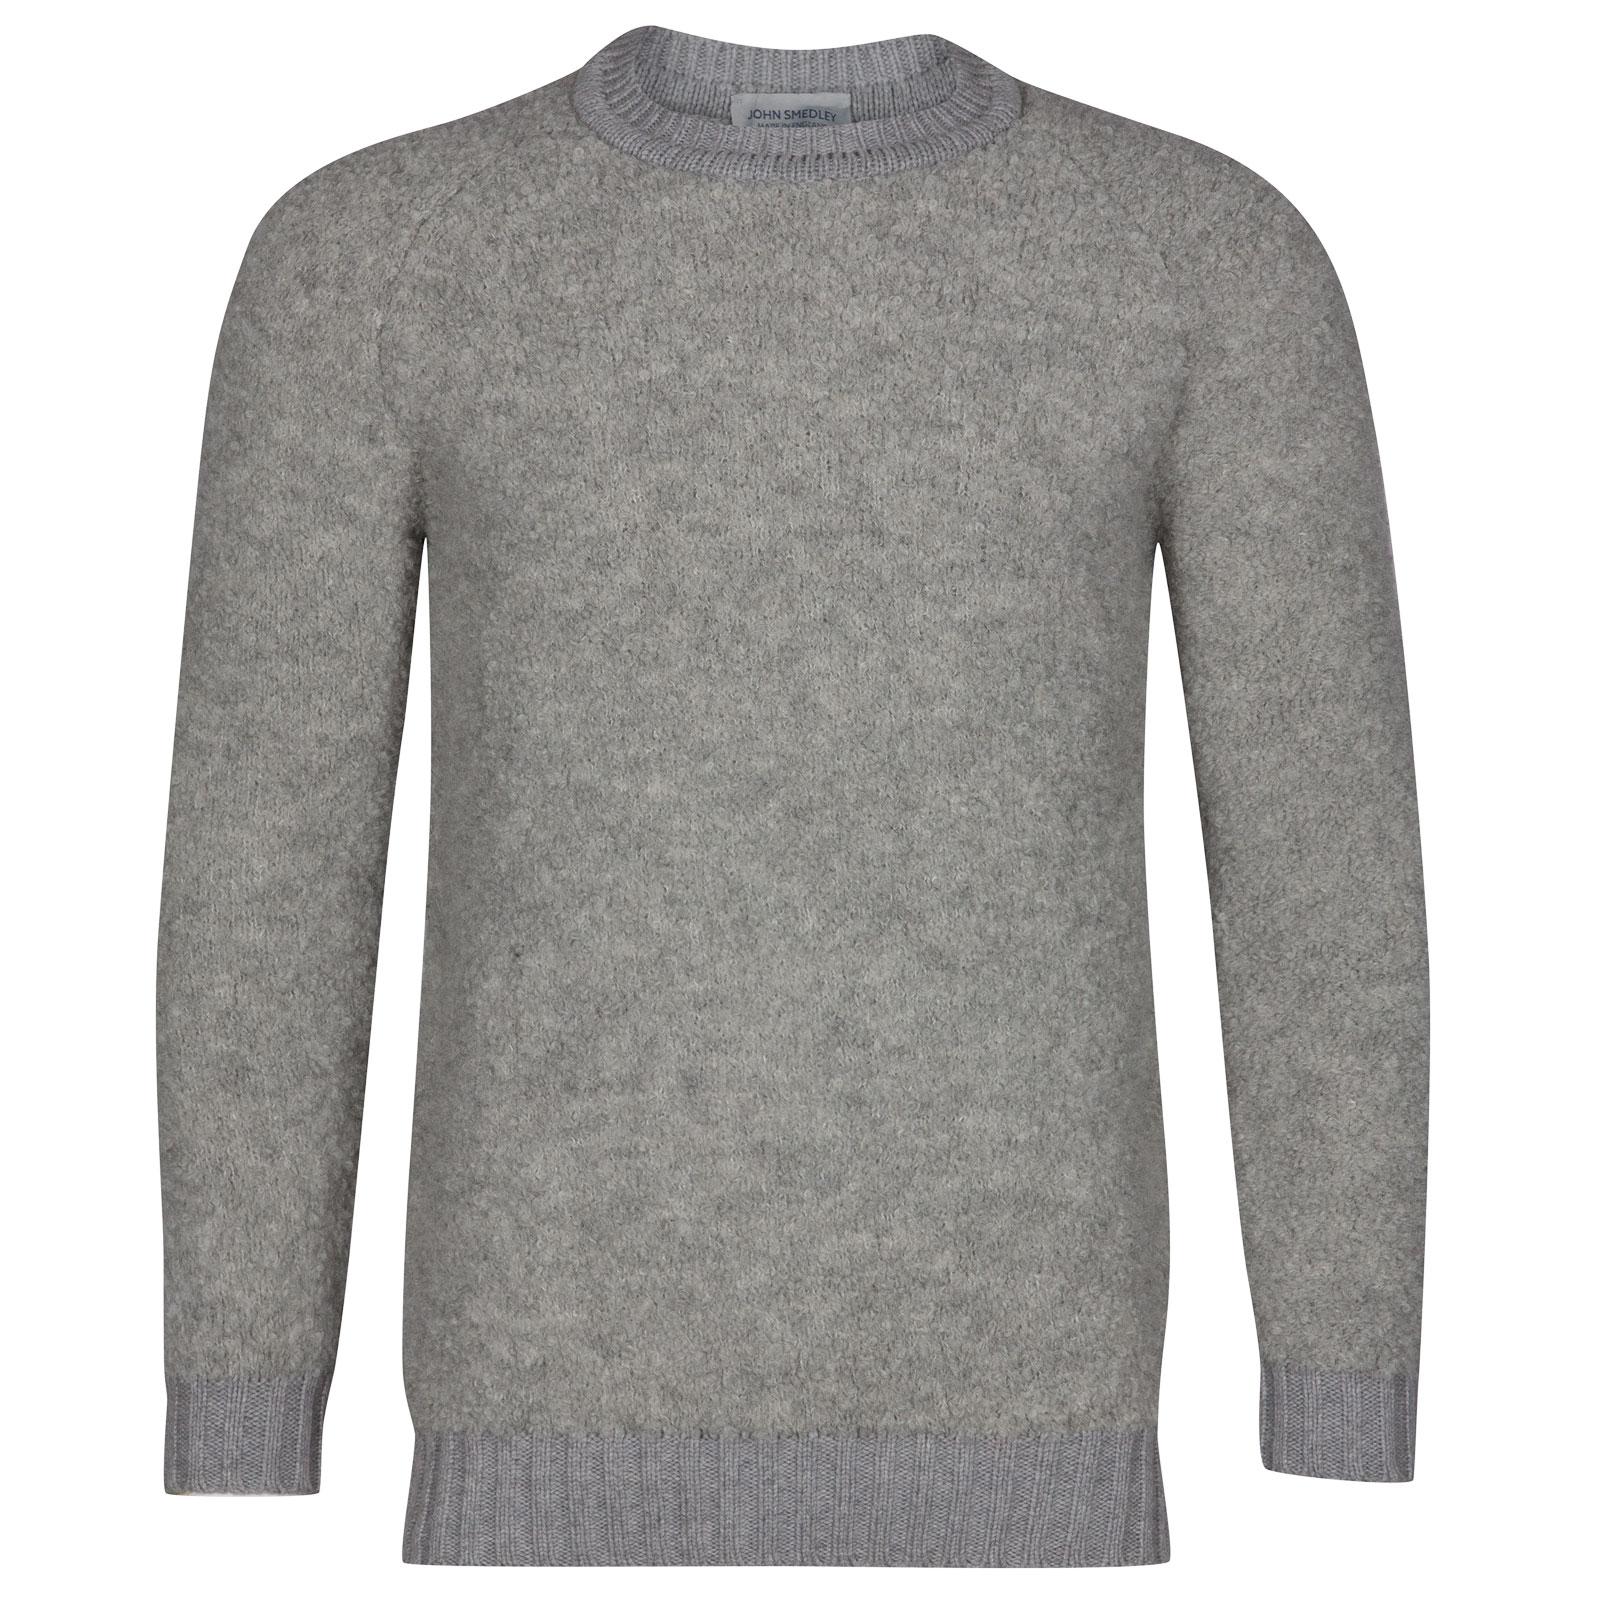 John Smedley Moss Alpaca & Wool Pullover in Silver-XL